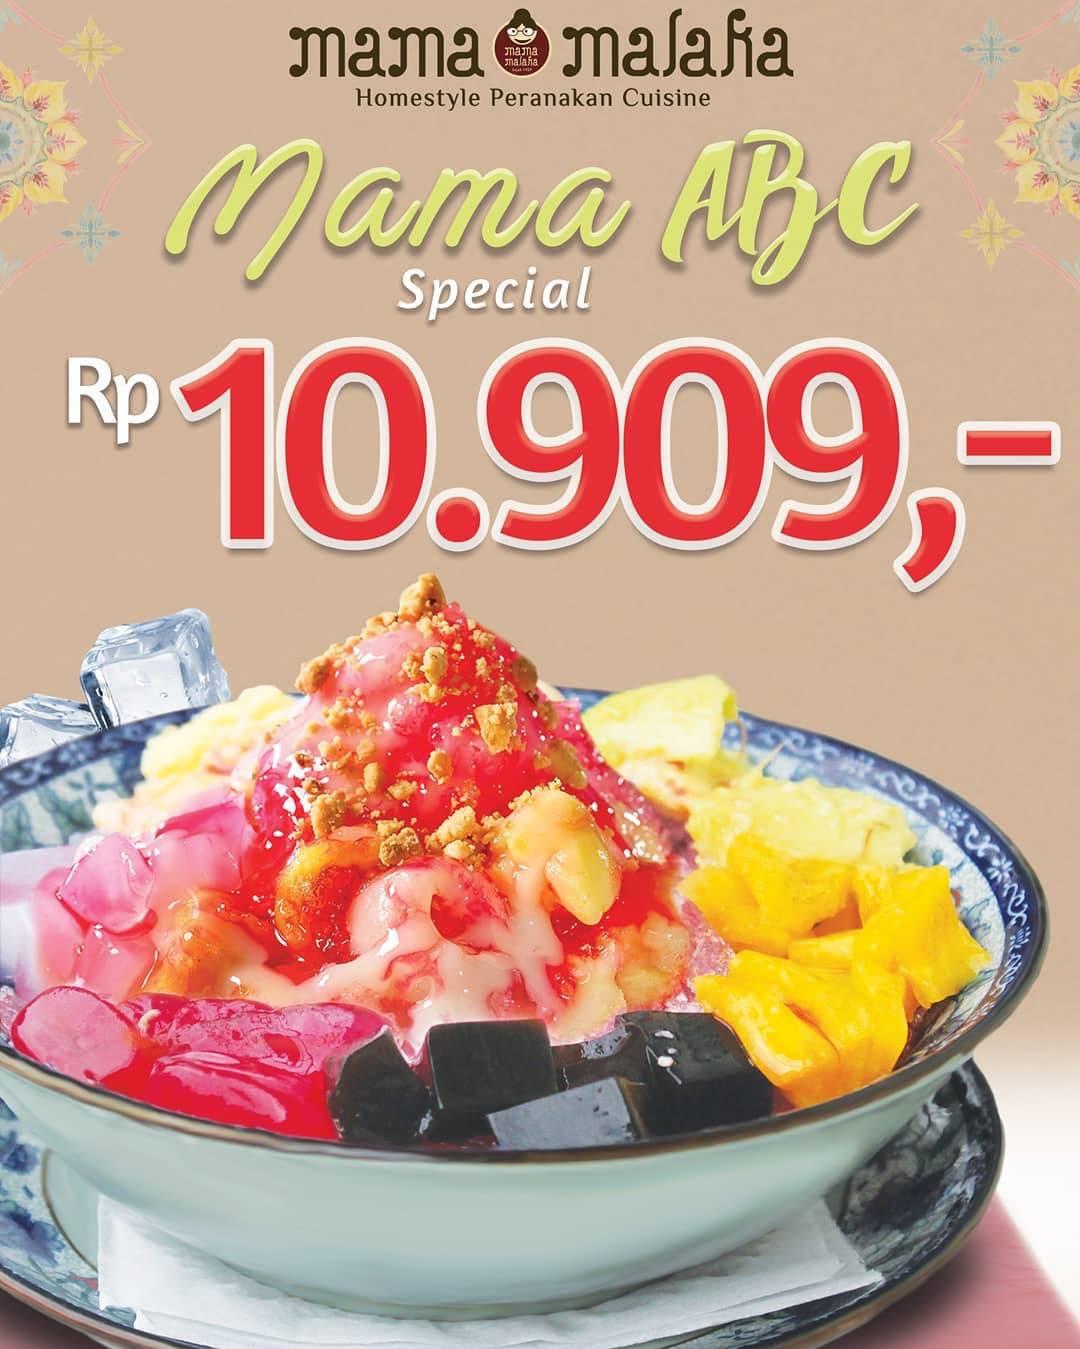 MAMA MALAKA Promo Special Price Rp. 10.909* untuk Menu Mama ABC